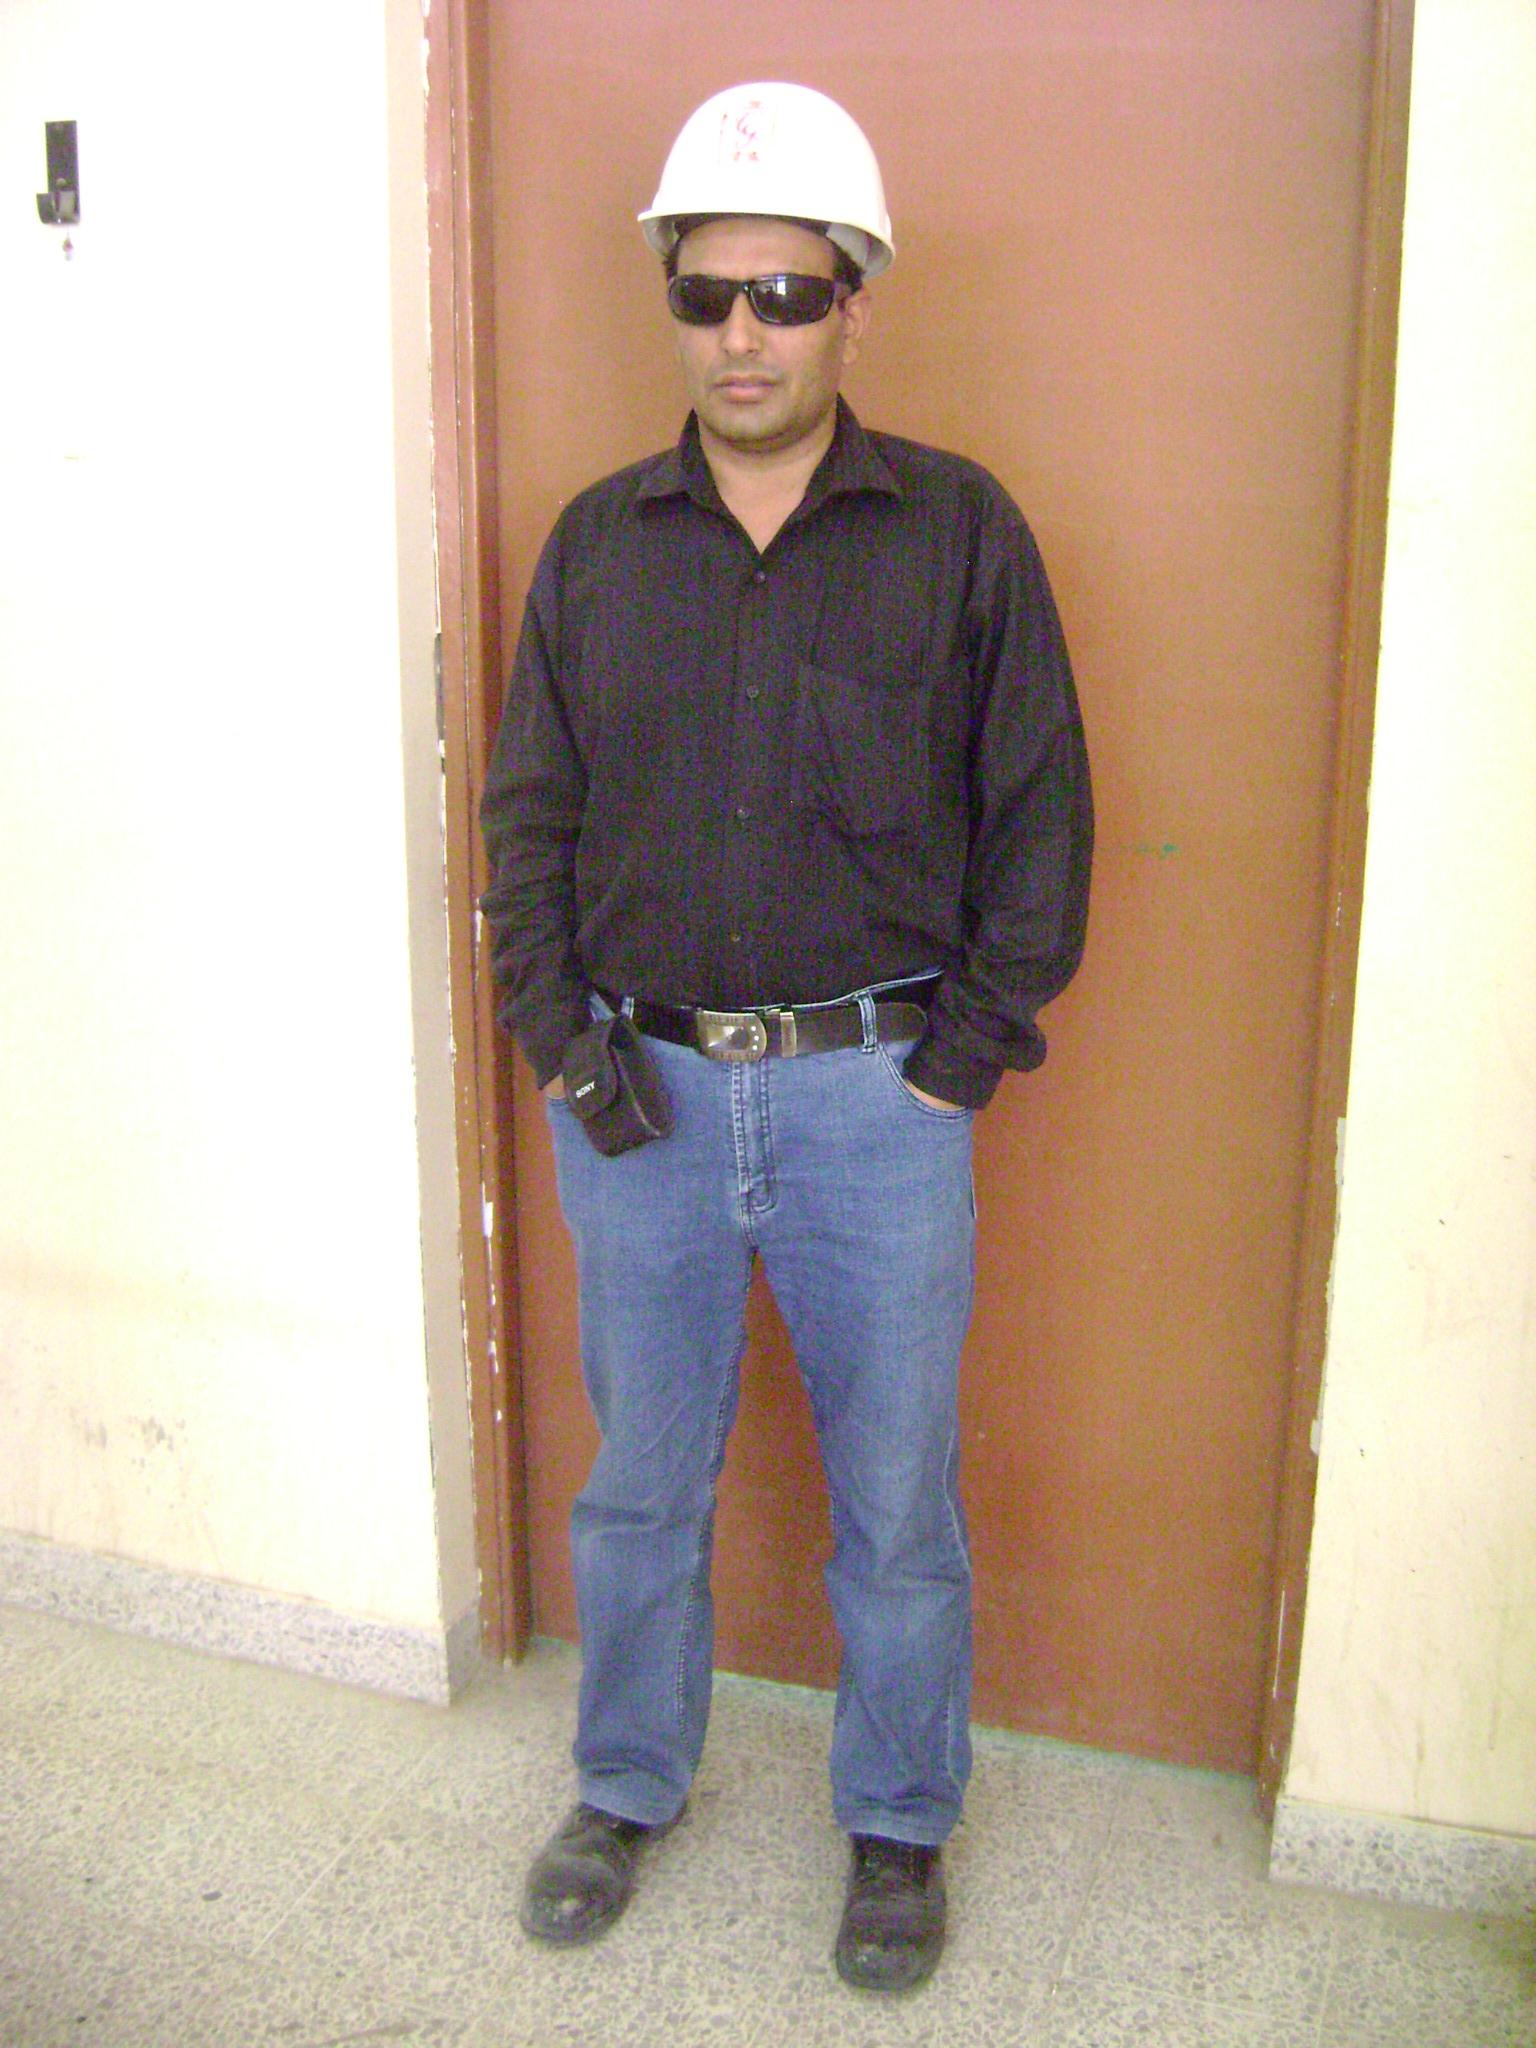 shahid farooq sabir